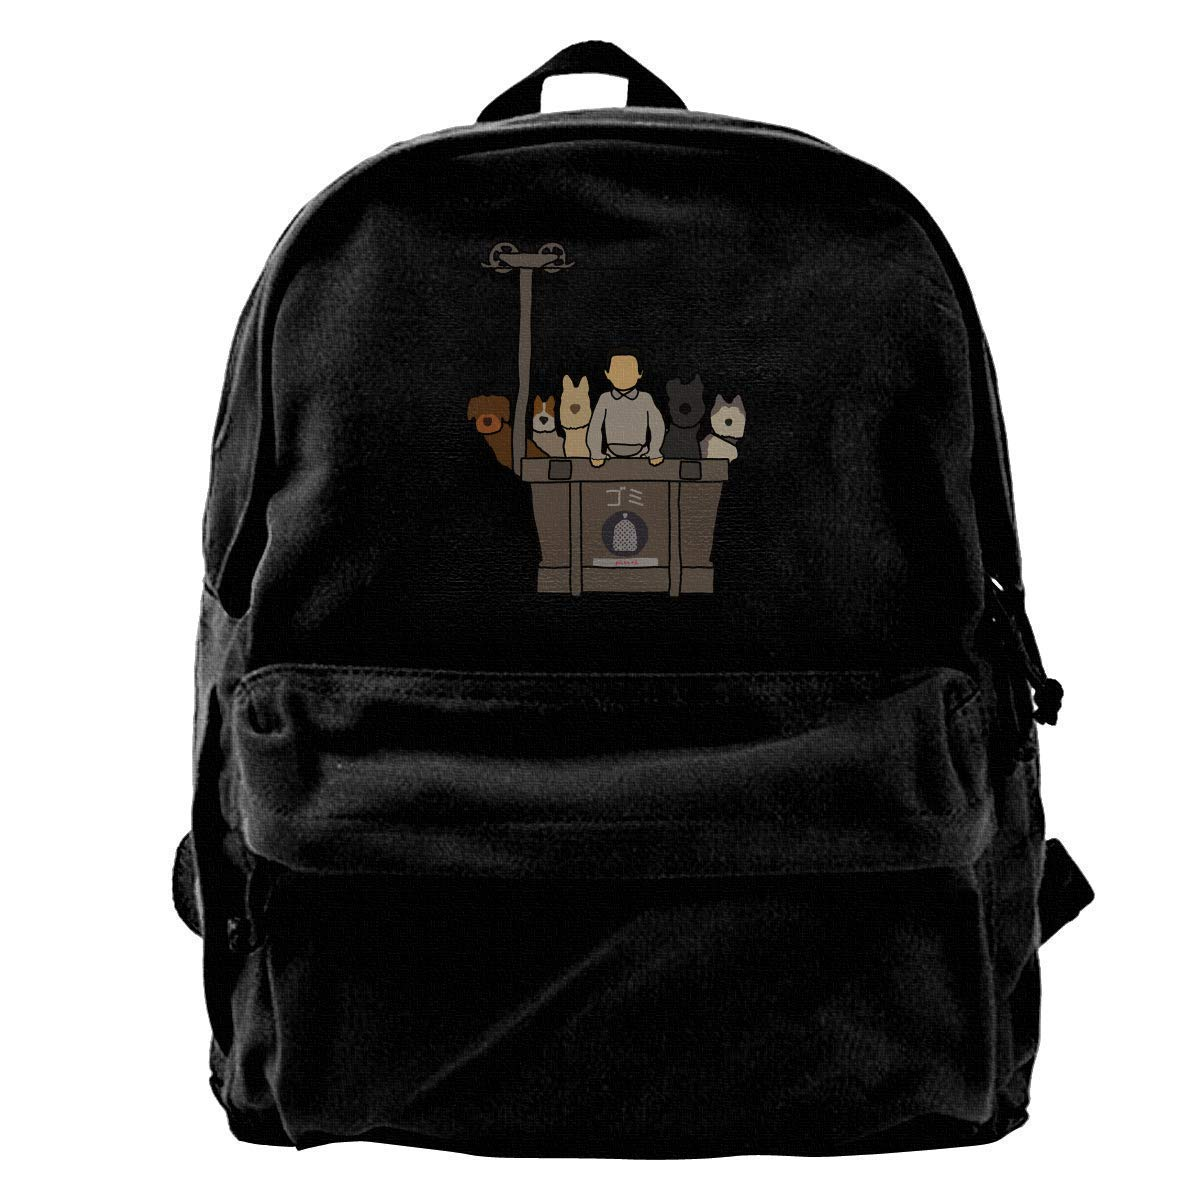 Ie of Dogs Canvas Shoulder Backpack Backpack for Men & Women Teens College Travel ypack Black